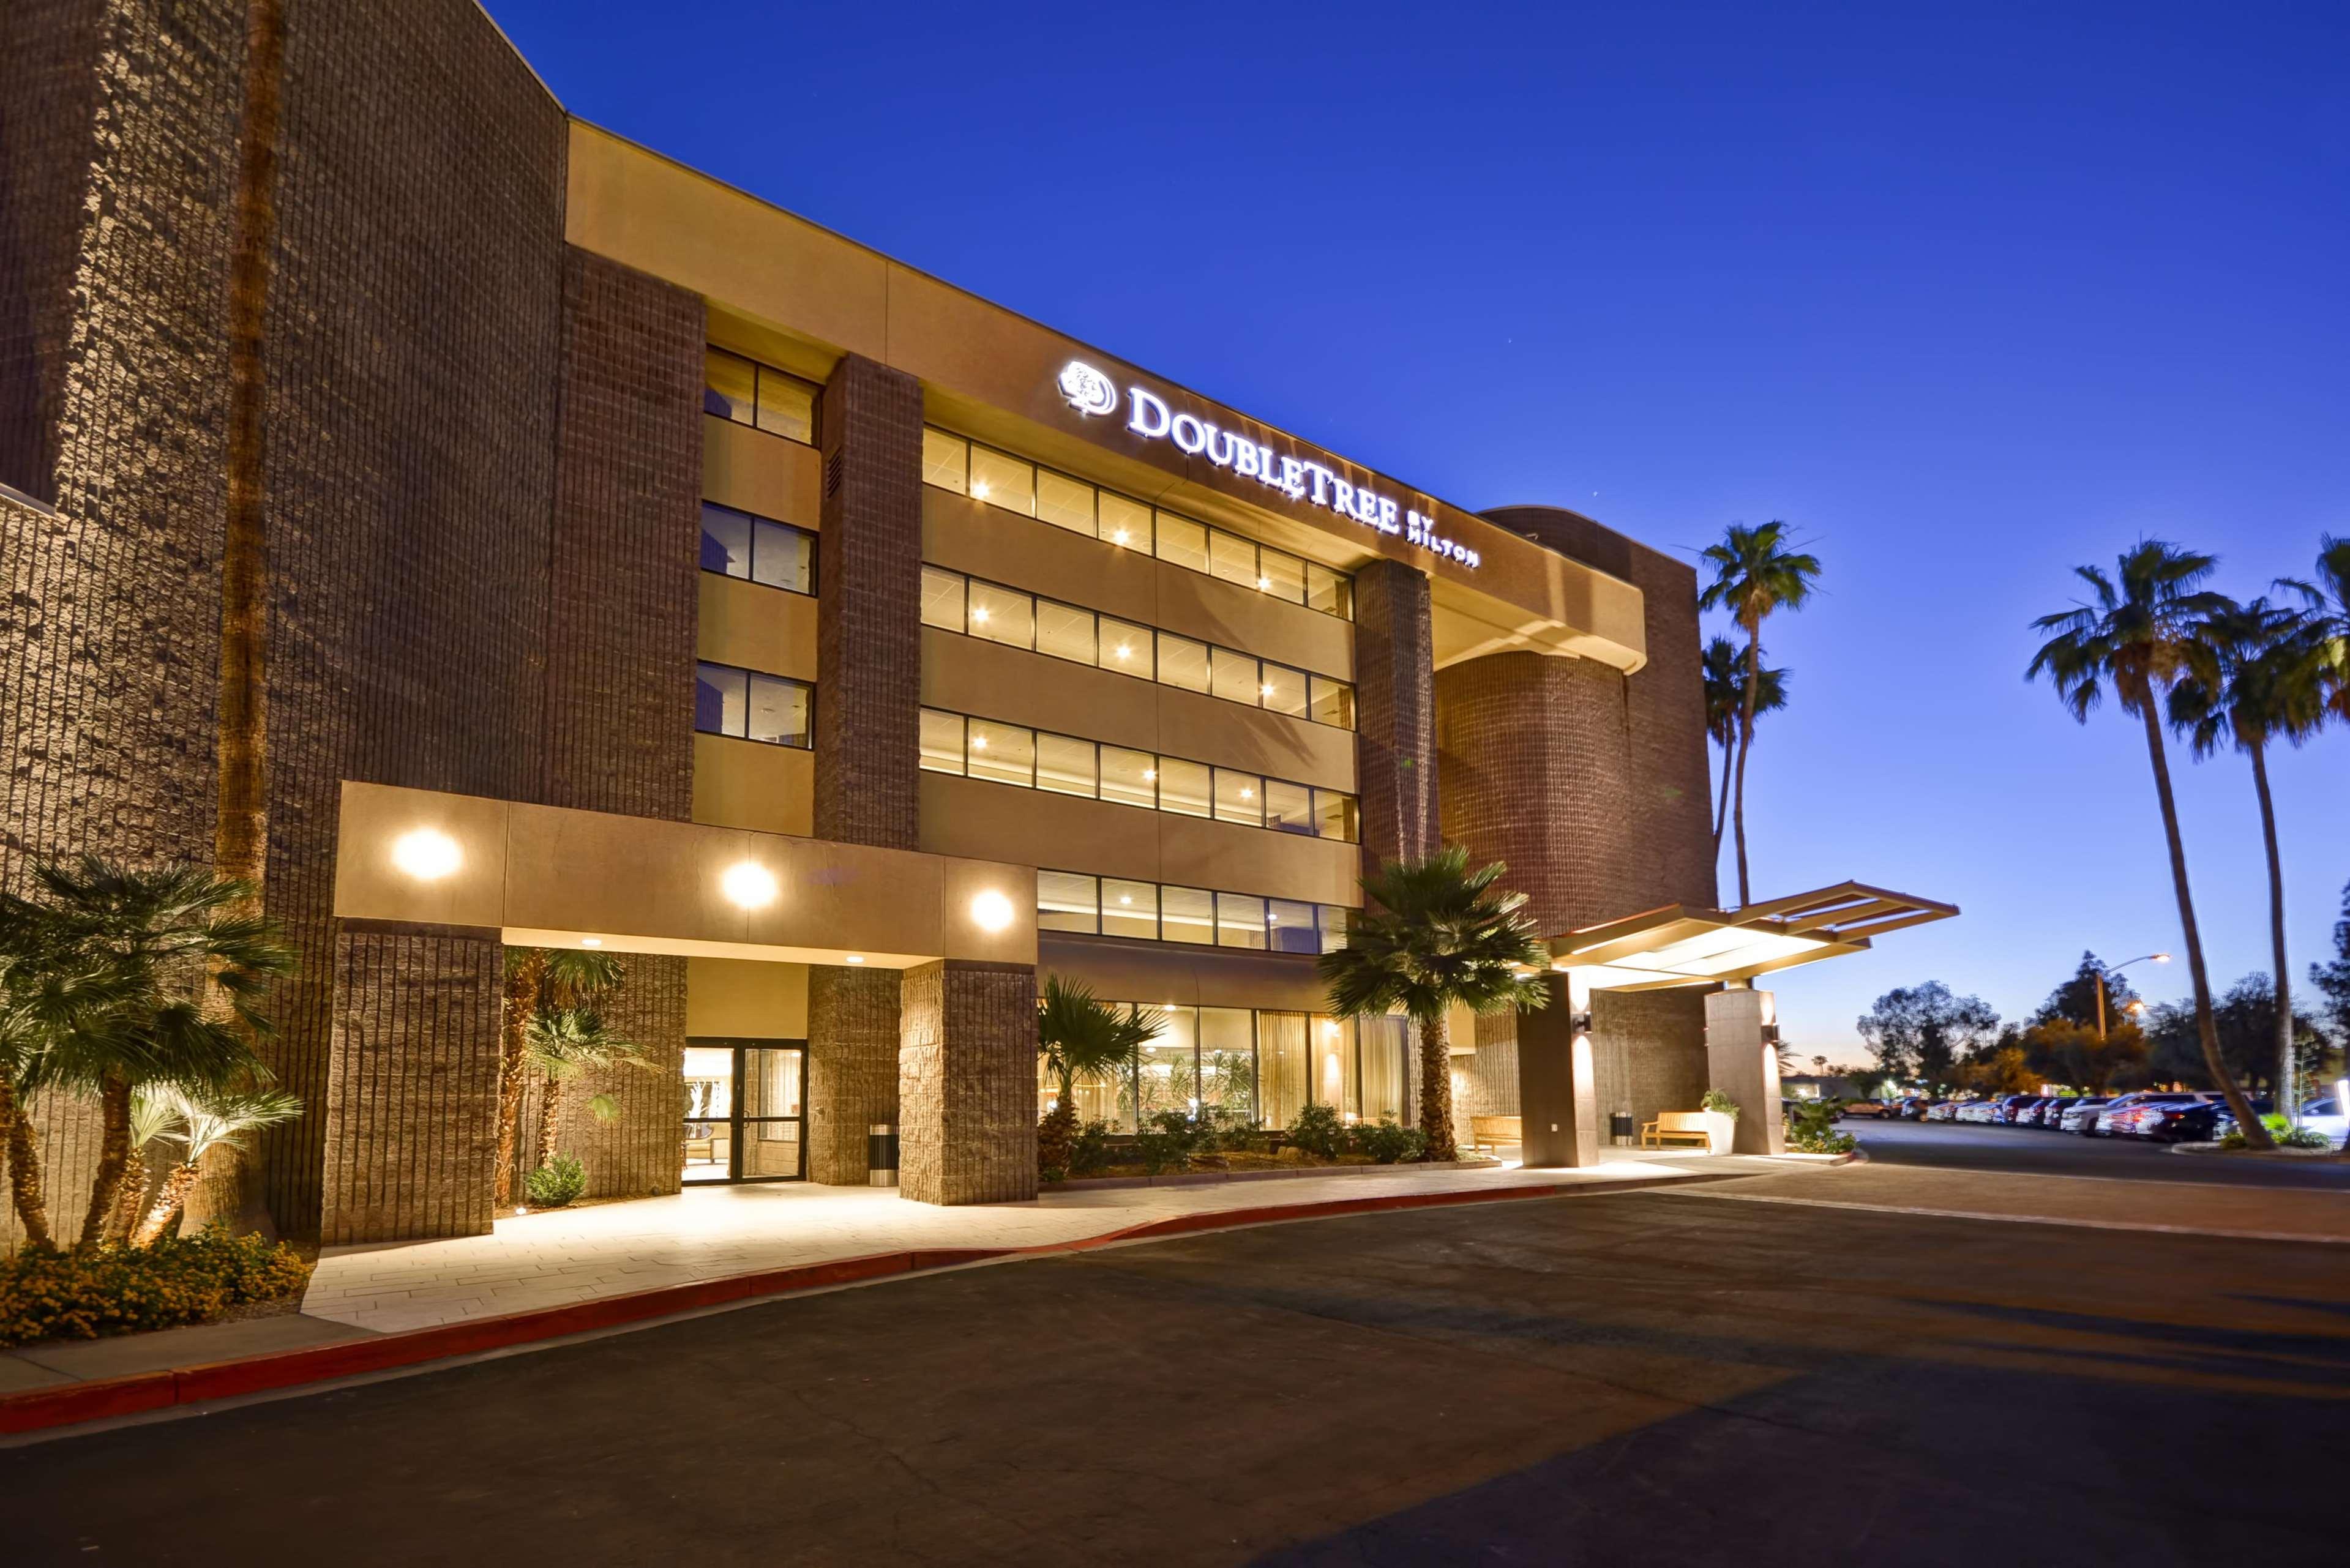 DoubleTree by Hilton Phoenix North image 0